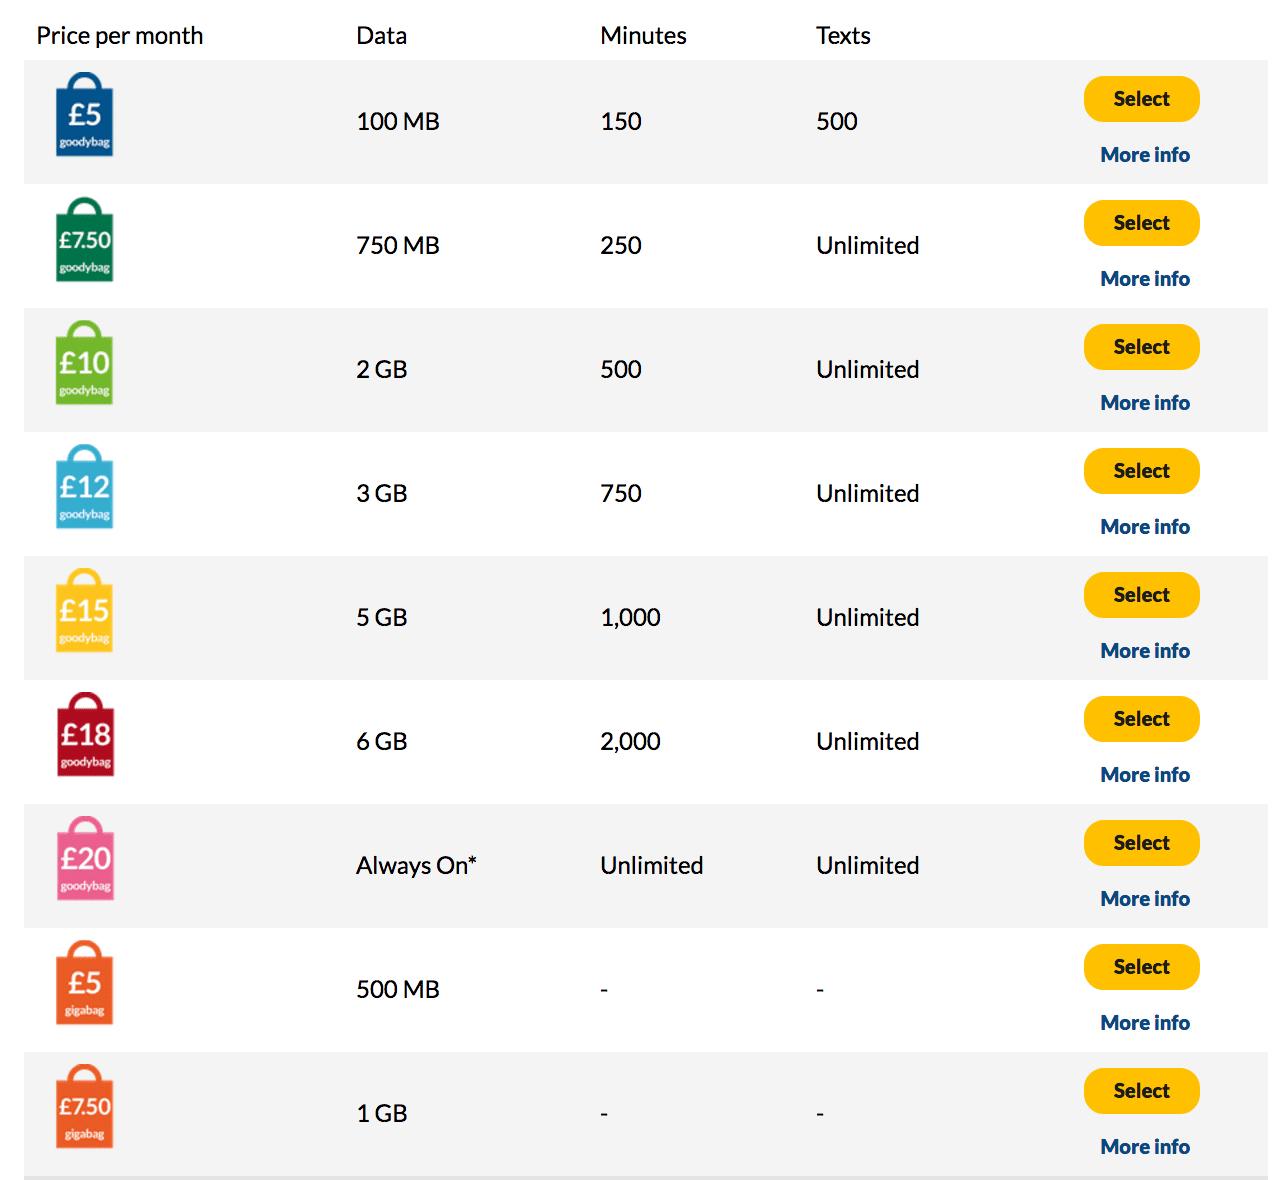 Tarifas de las SIM de Giffgaff para móvil